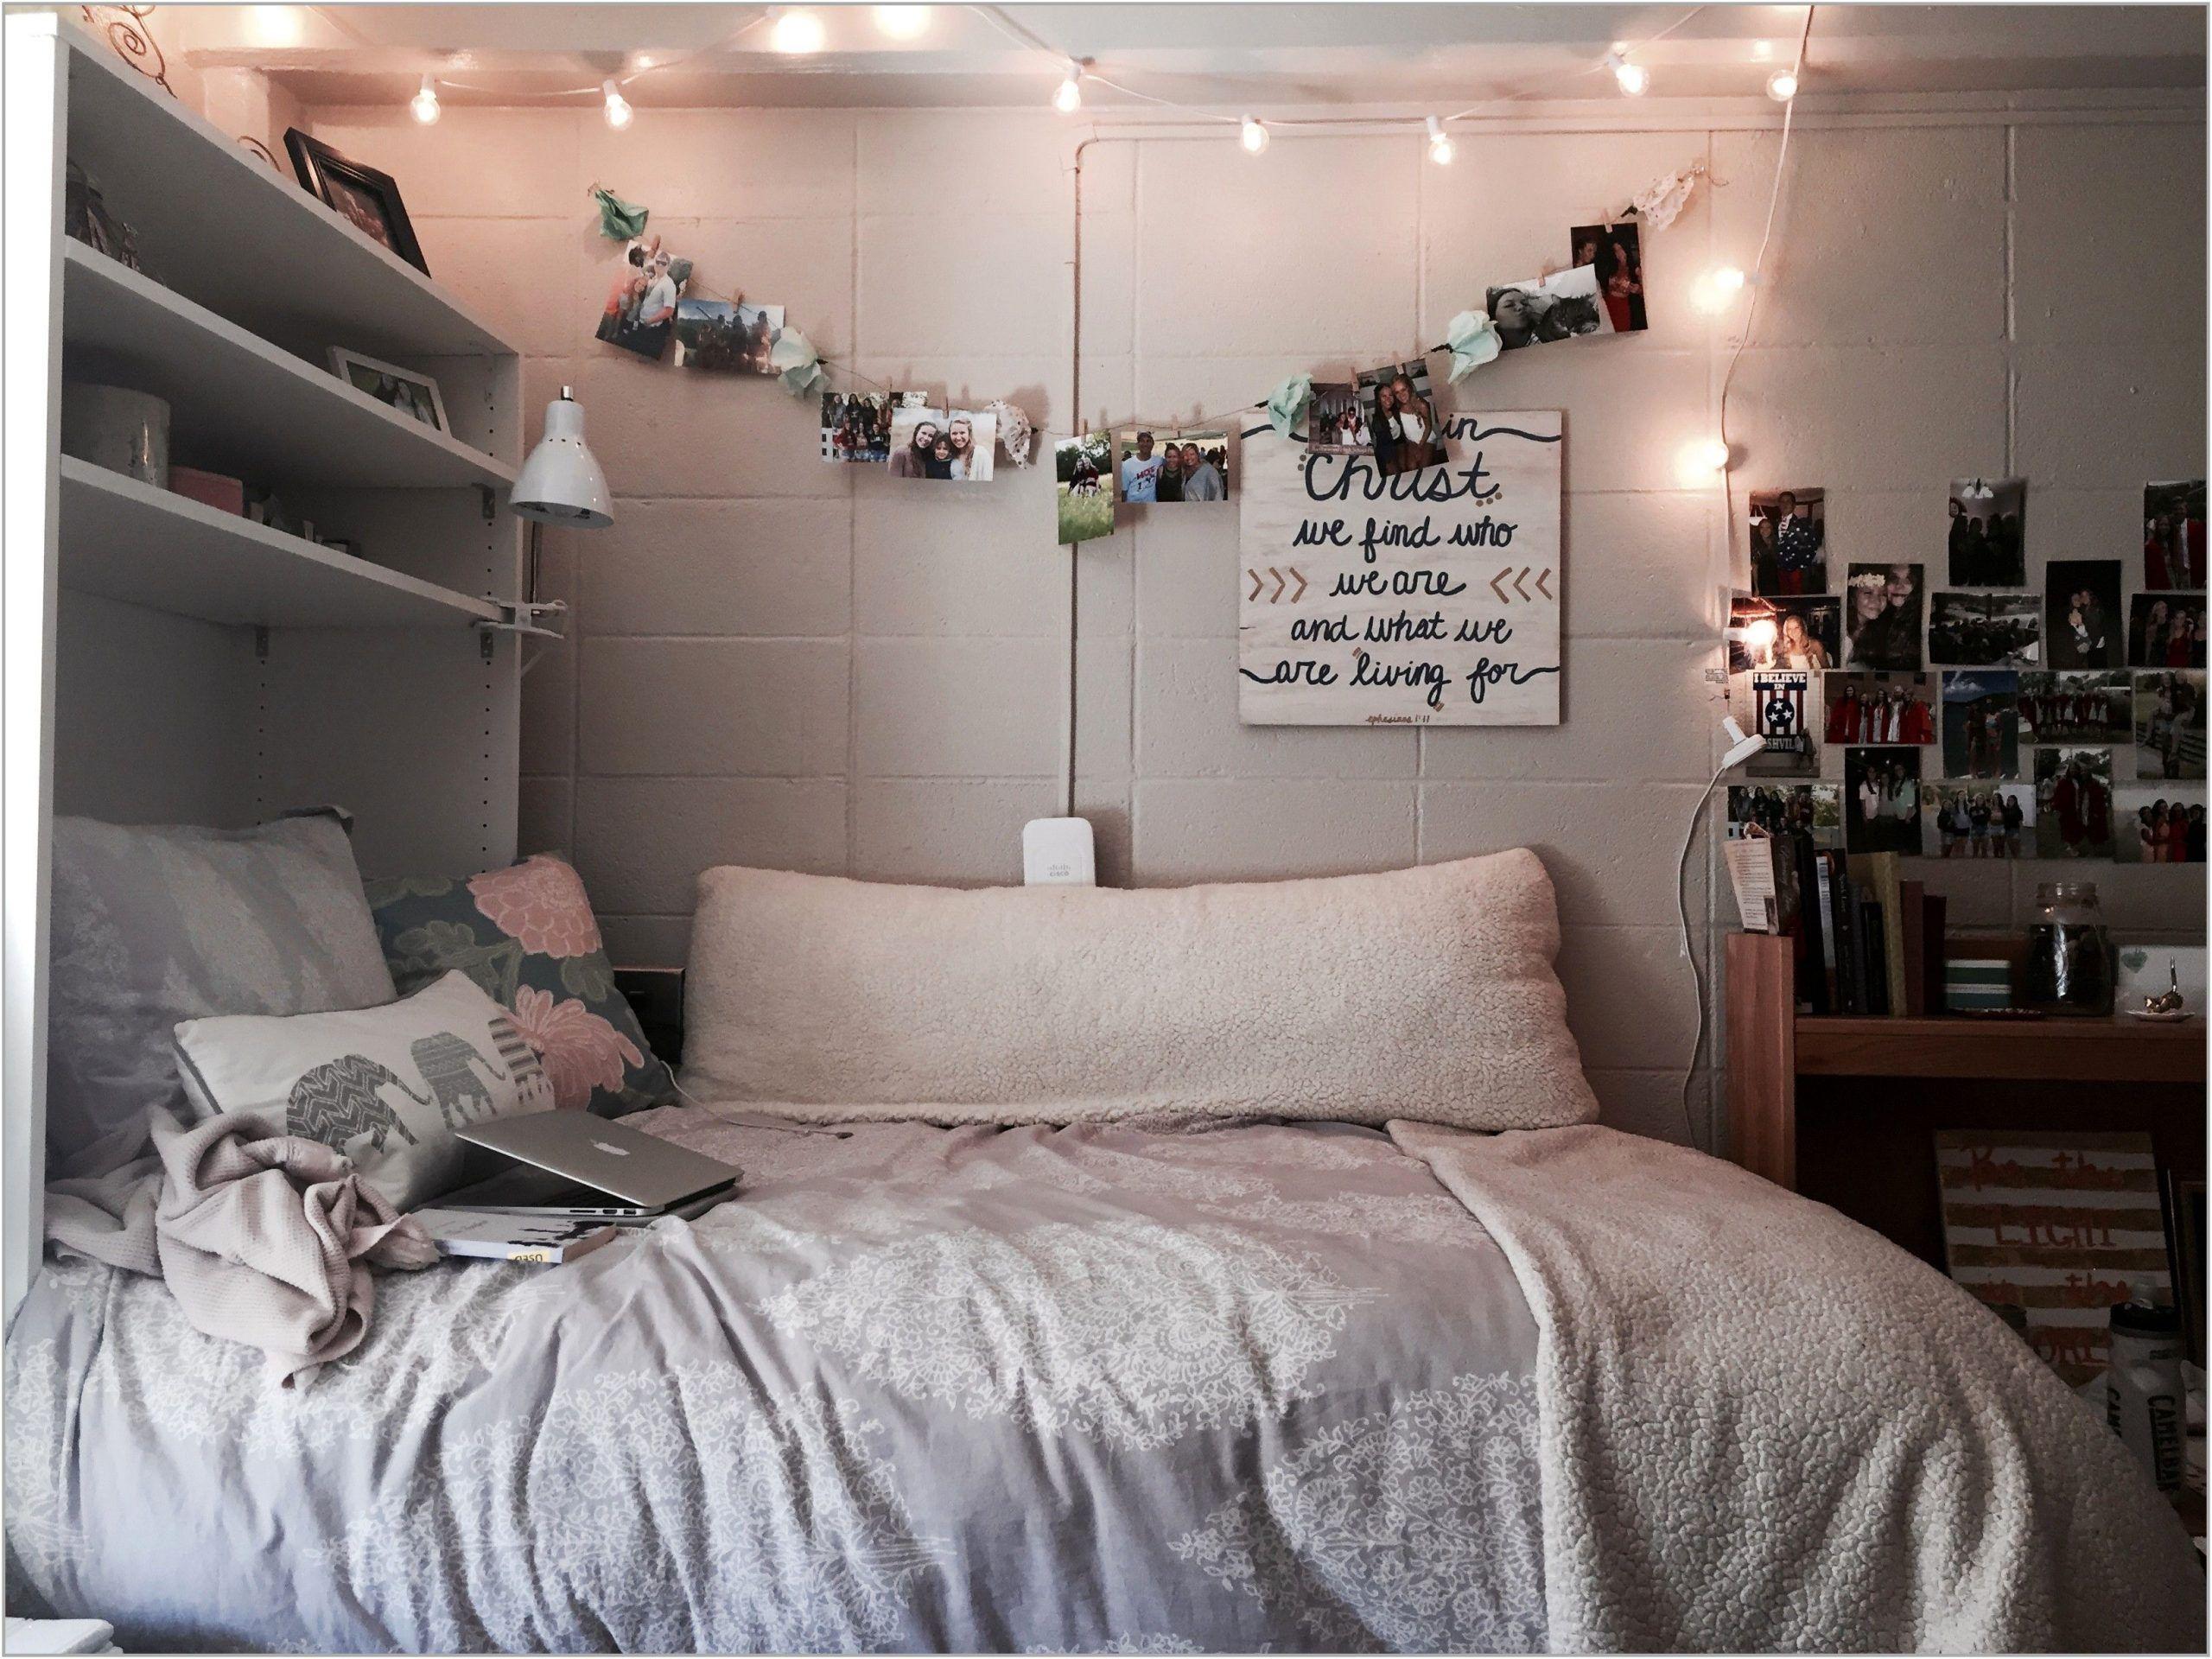 Inspirational Bedroom Decor Tumblrbedroom decor